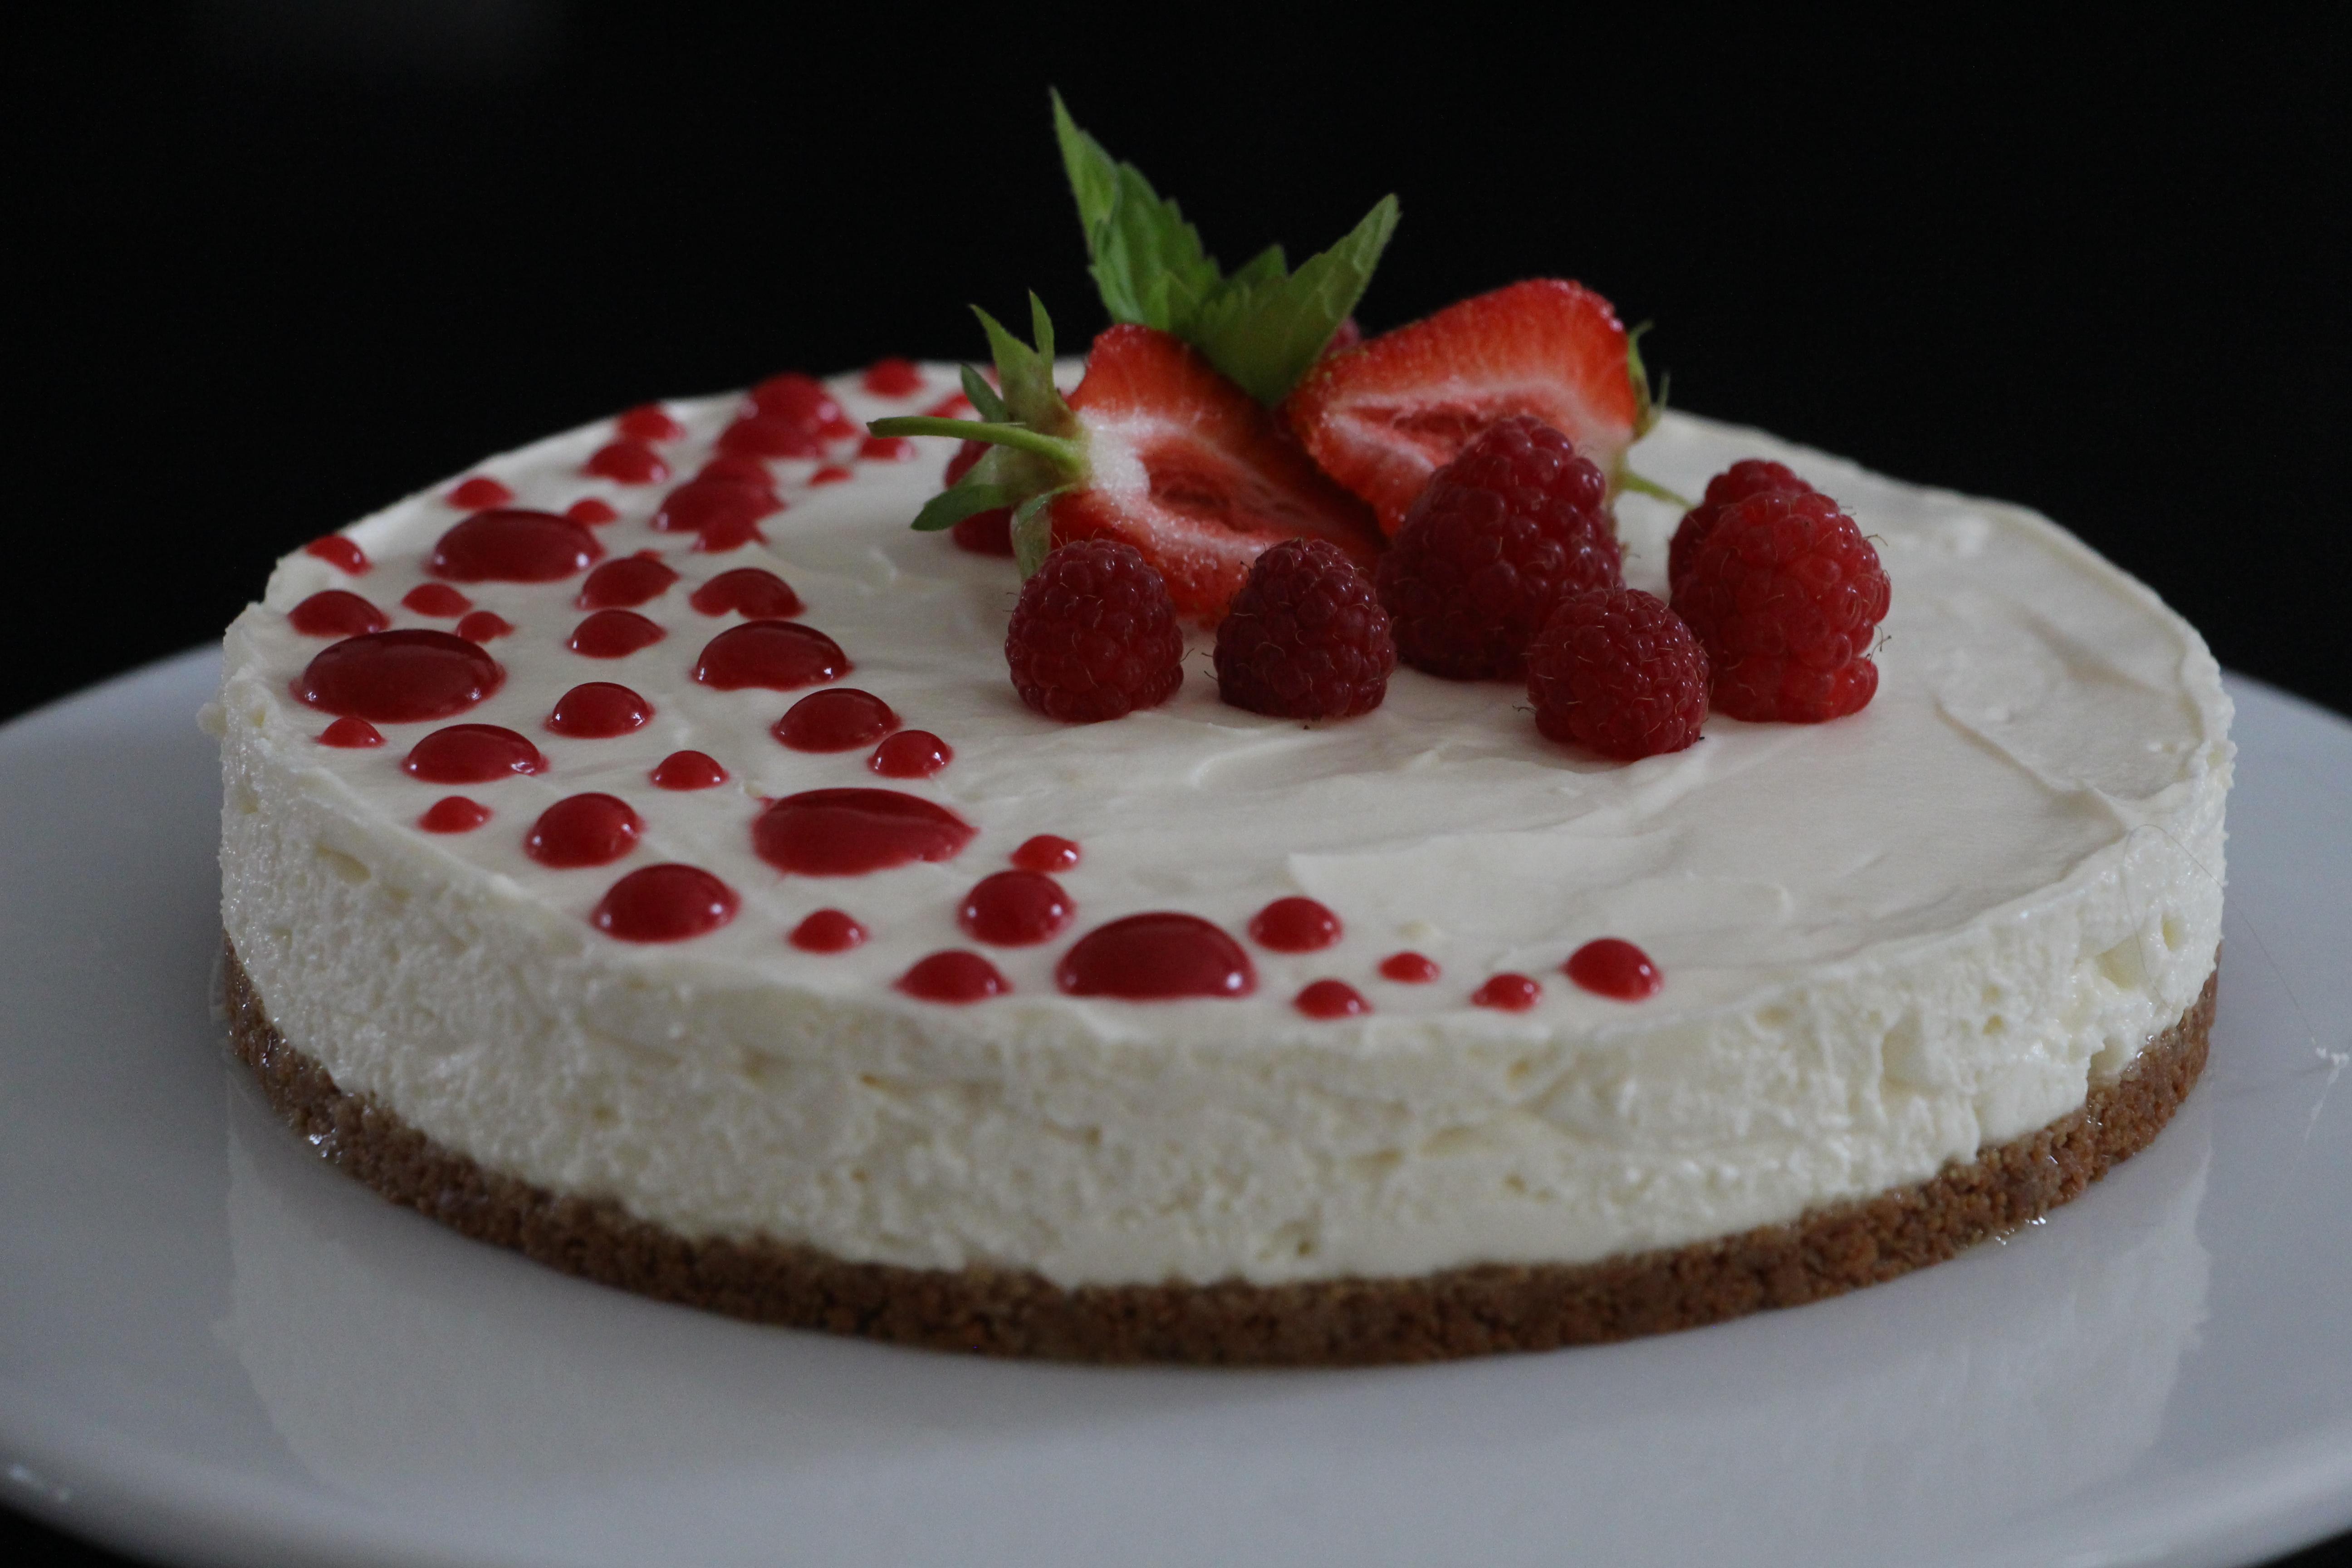 Le Cheesecake sans cuisson – Casserole & Chocolat